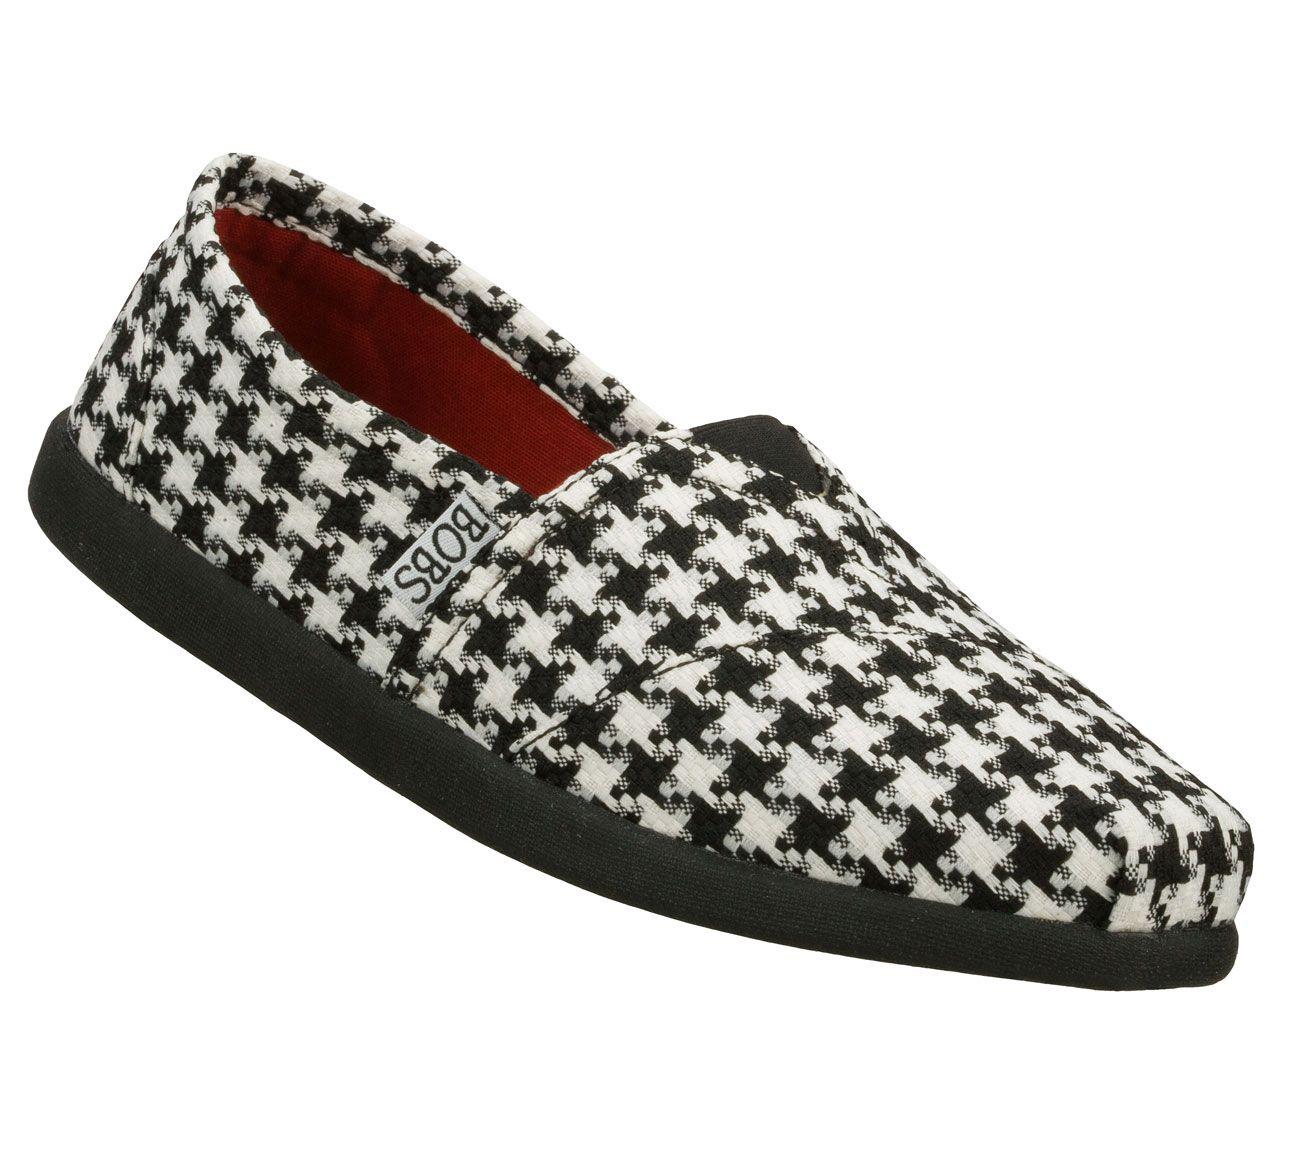 Bobs Shoes Alabama Houndstooth Skechers Com Rolltide Bob Shoes Alabama Shoes Casual Flat Shoes